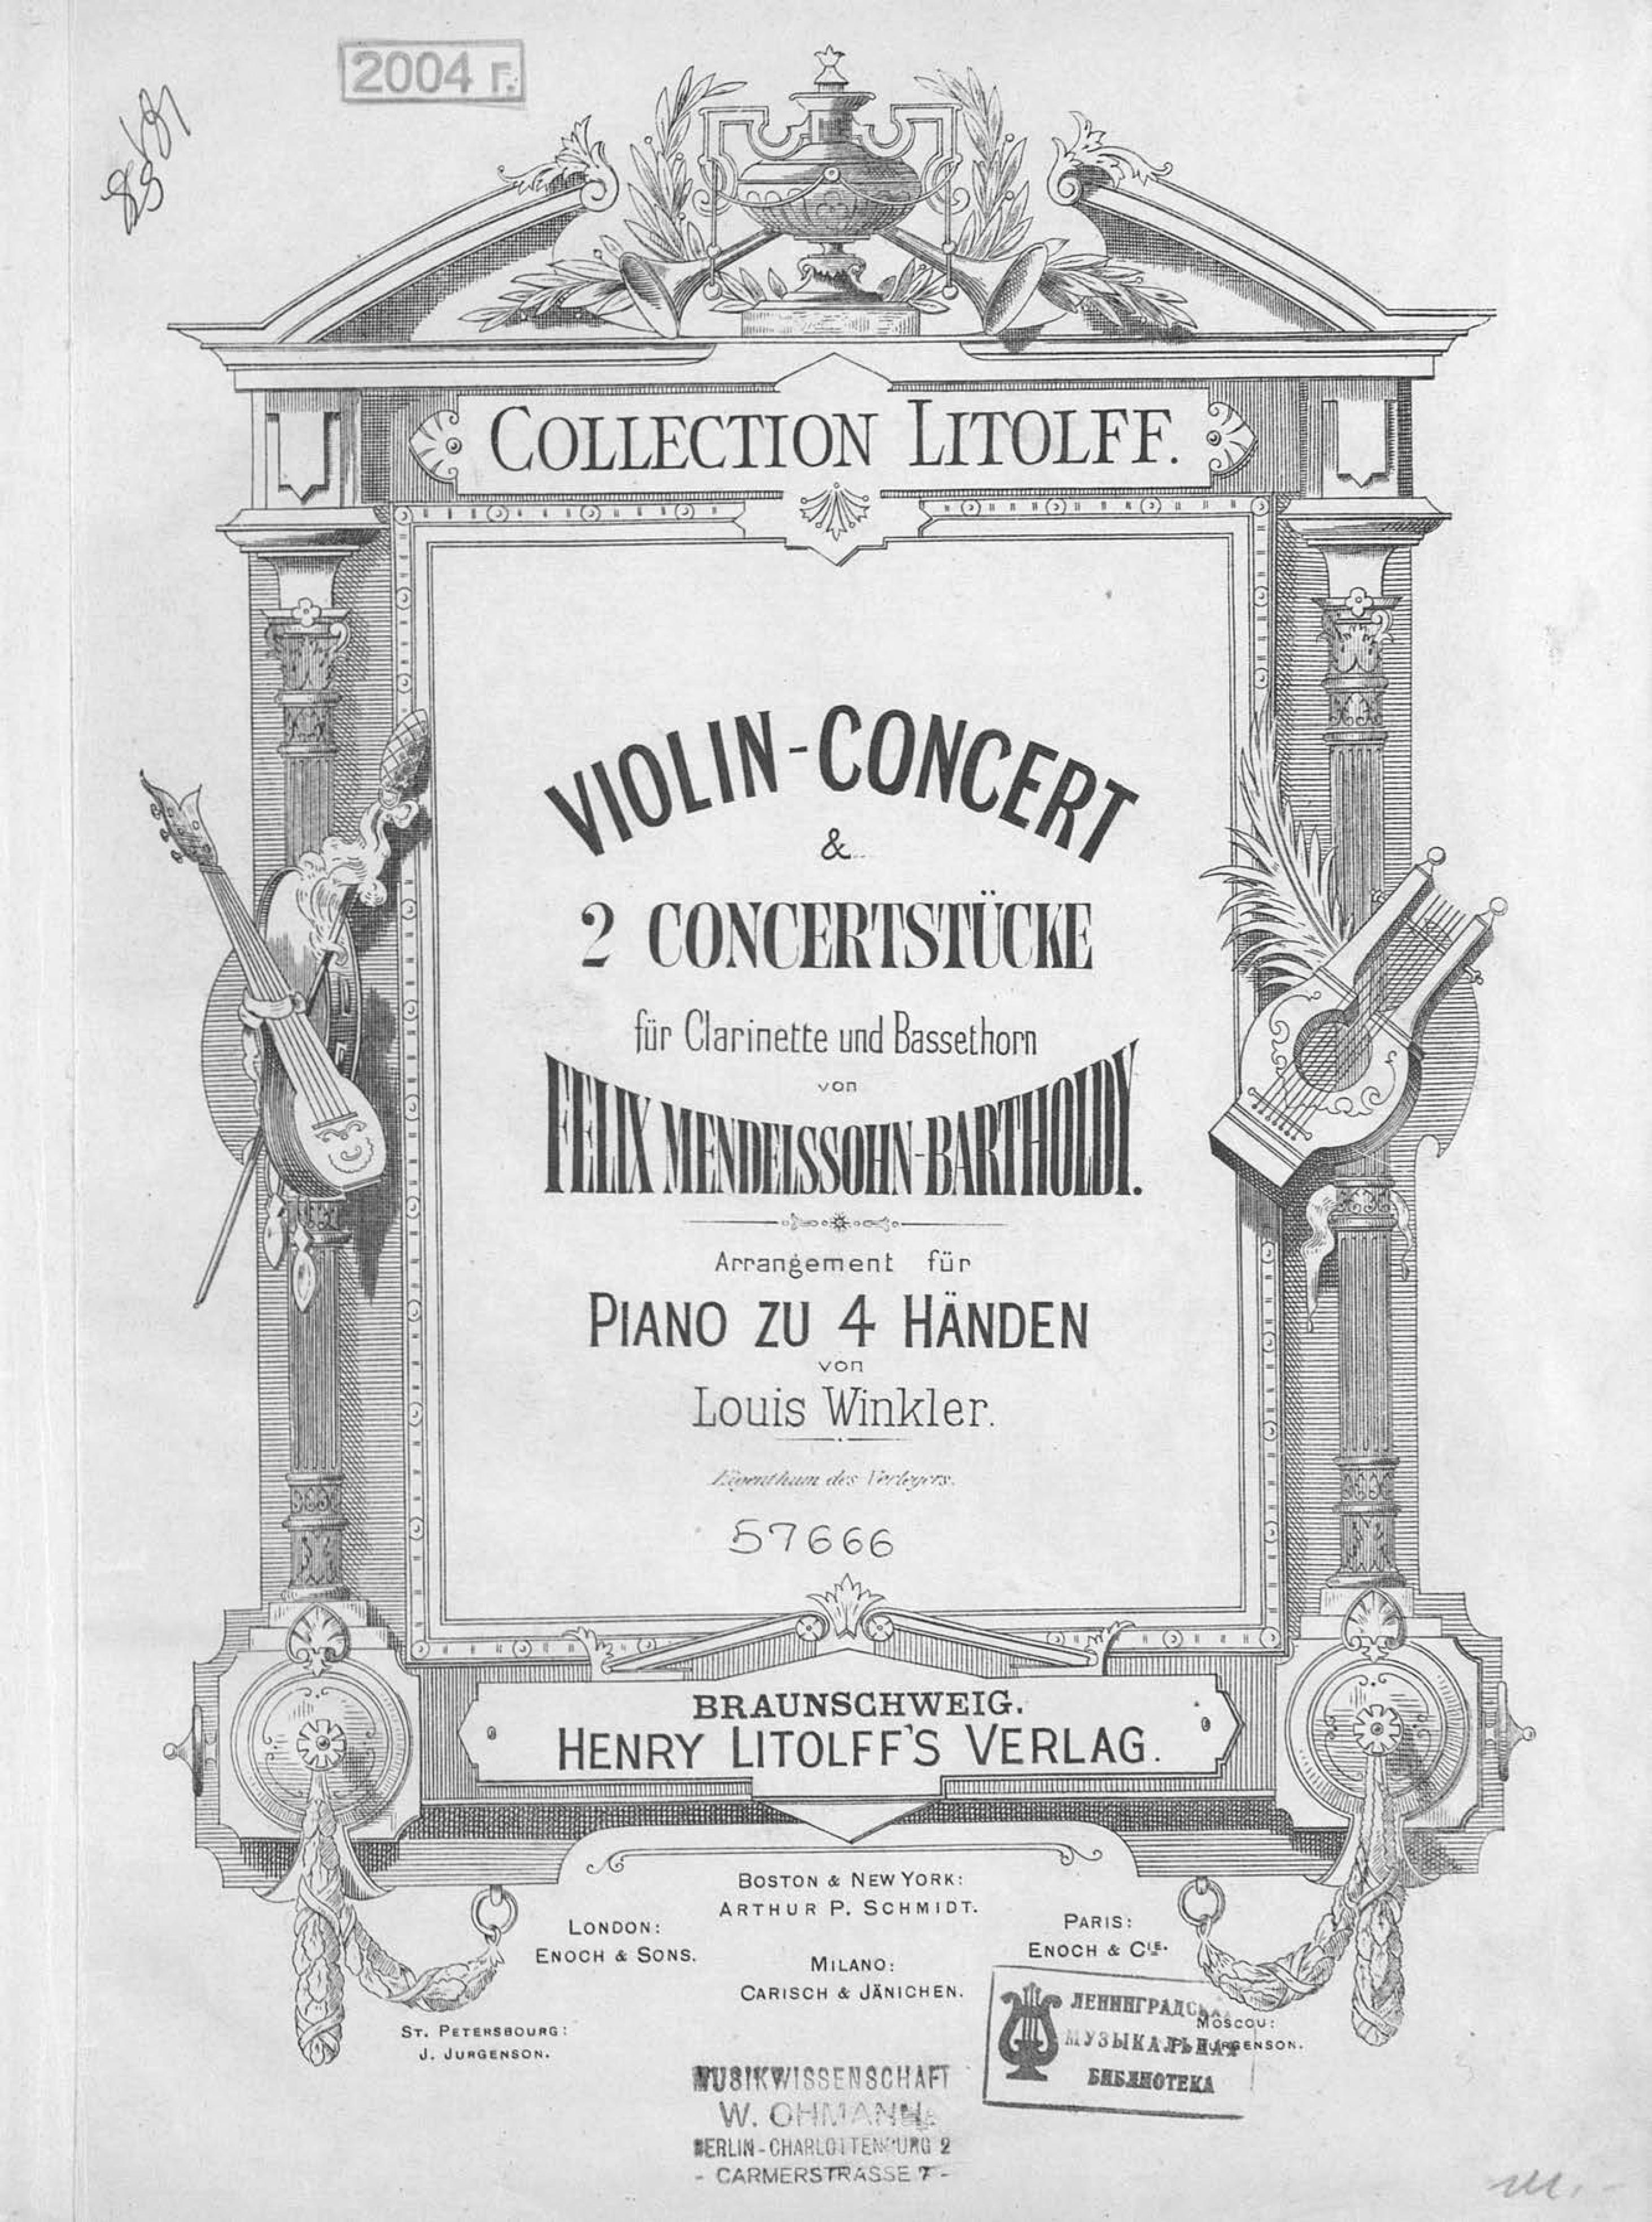 Феликс Мендельсон-Бартольди Violin-Concert & 2 Concertstucke fur Clarinette und Bassethorn v. F. Mendelssohn-Bartholdy феликс блуменфельд экспромт